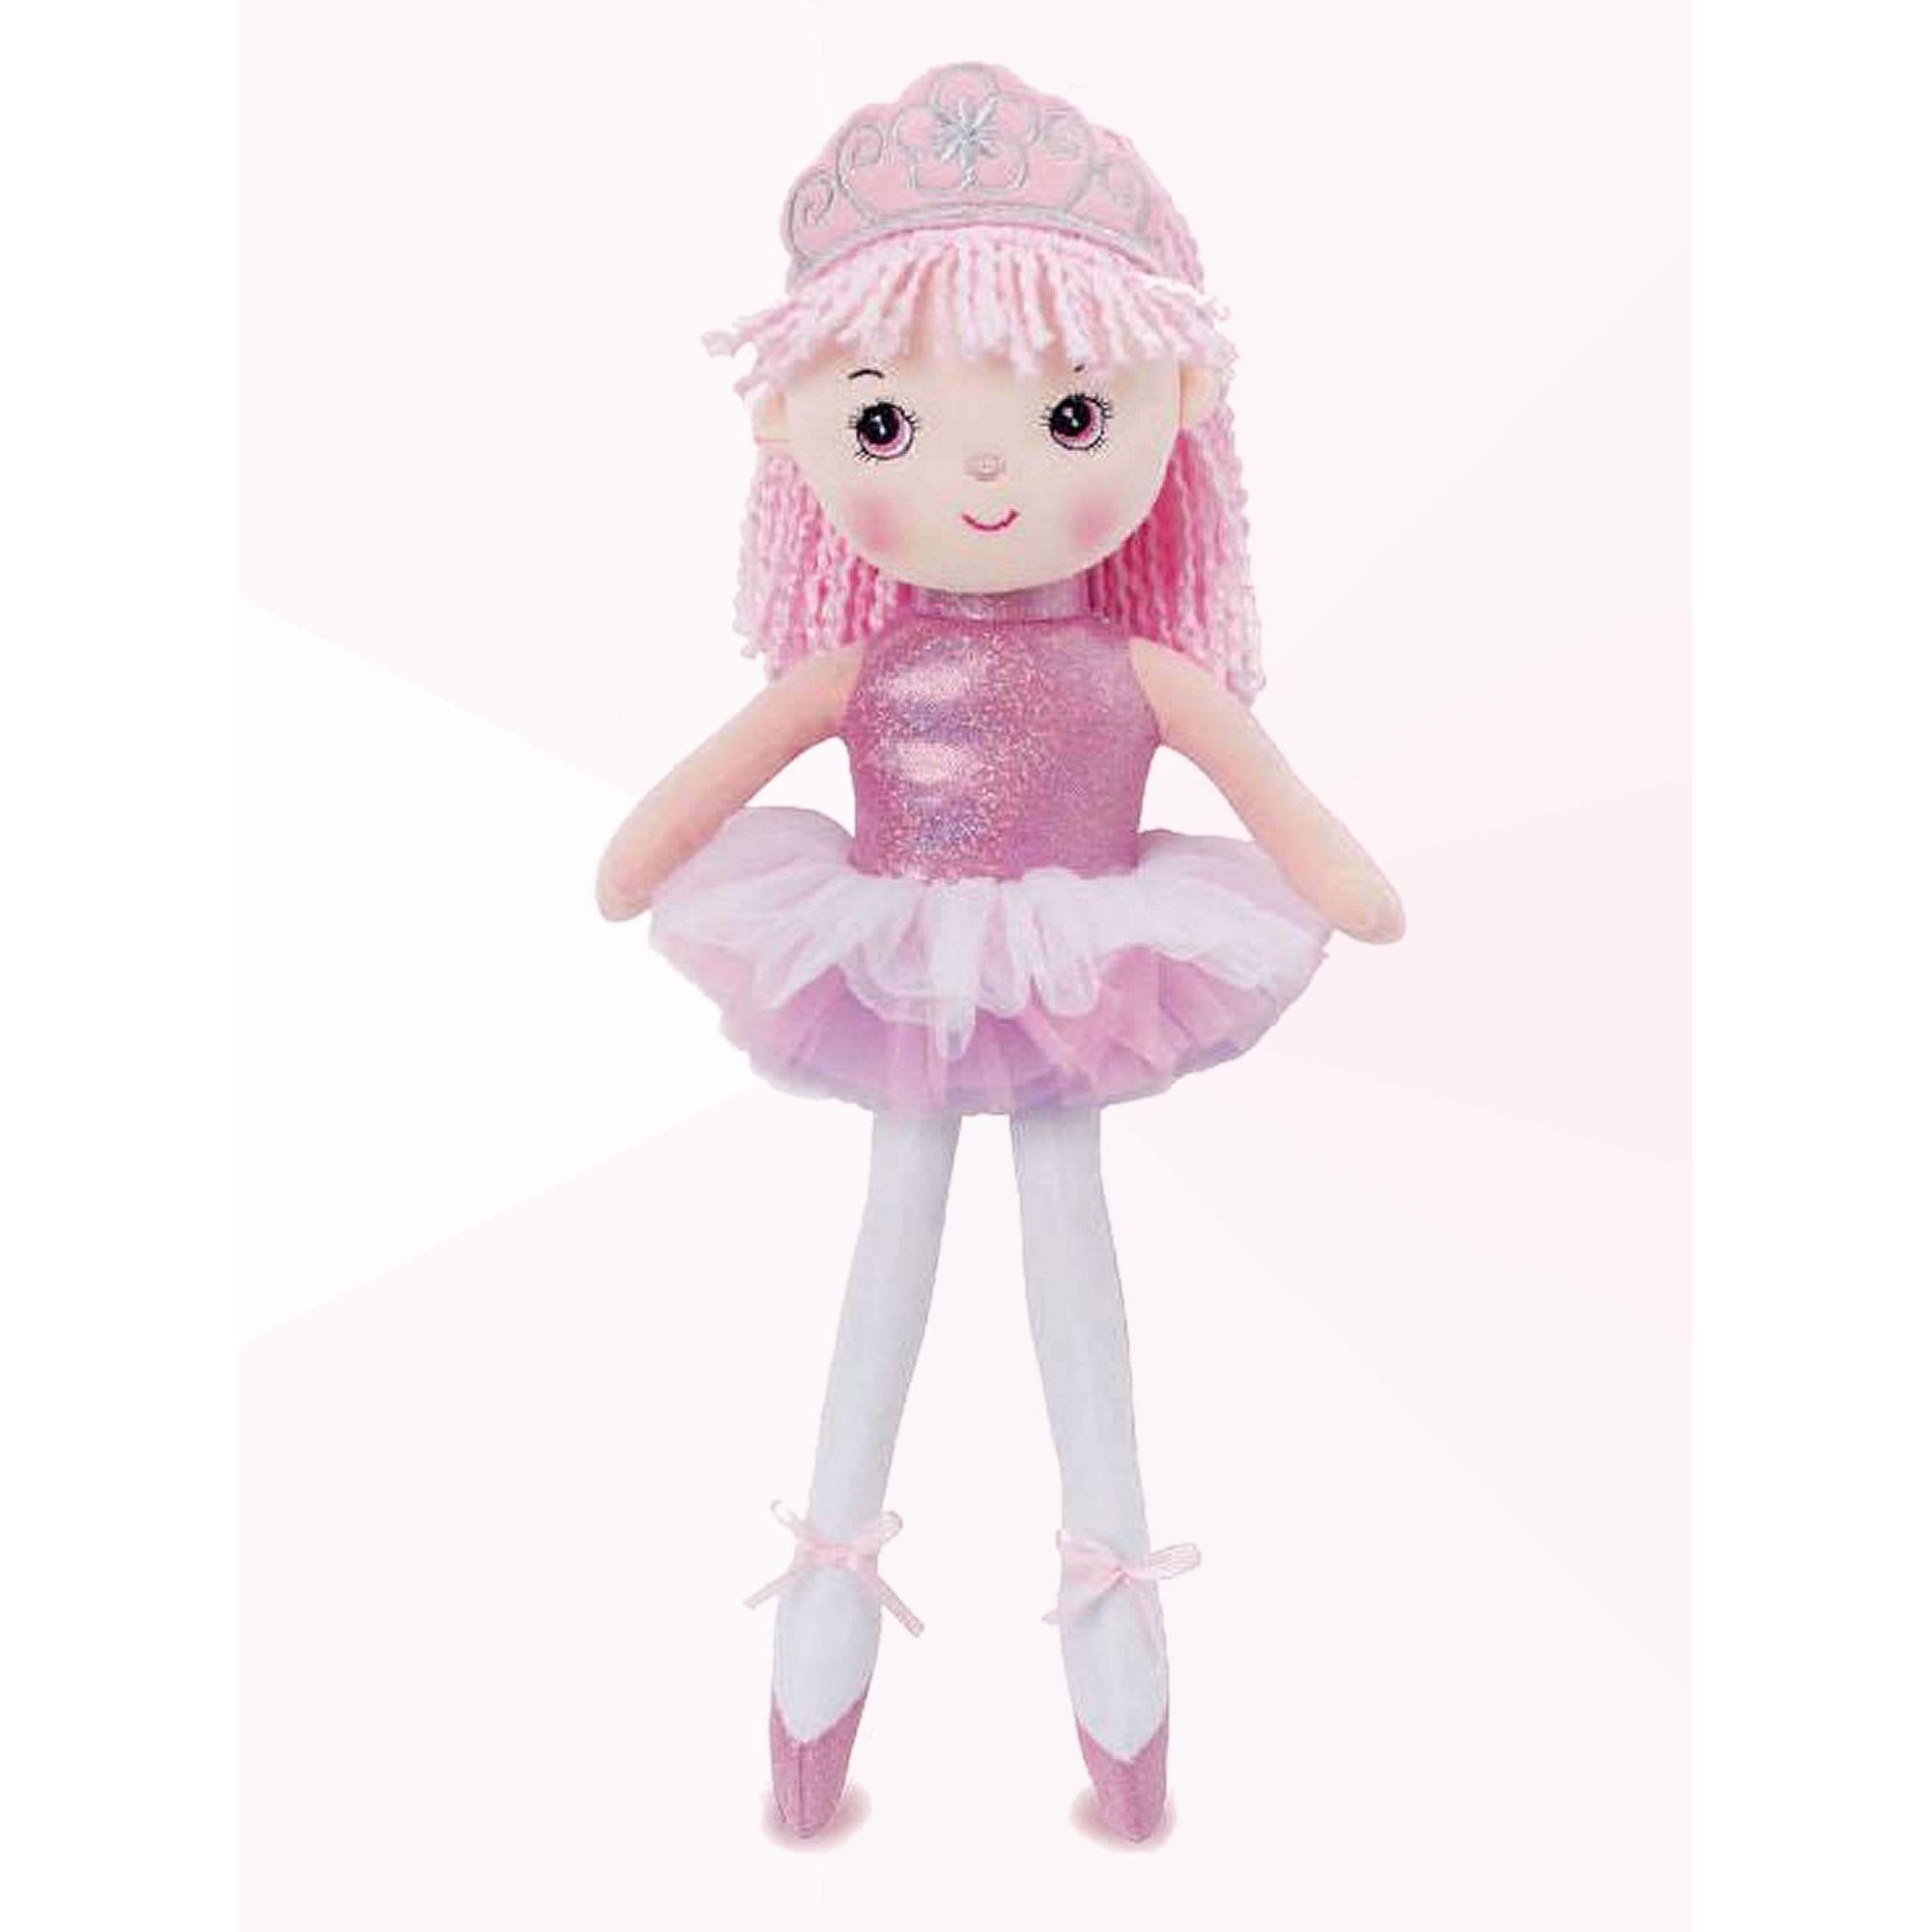 boneca-princesa-bailarina-rosa-buba